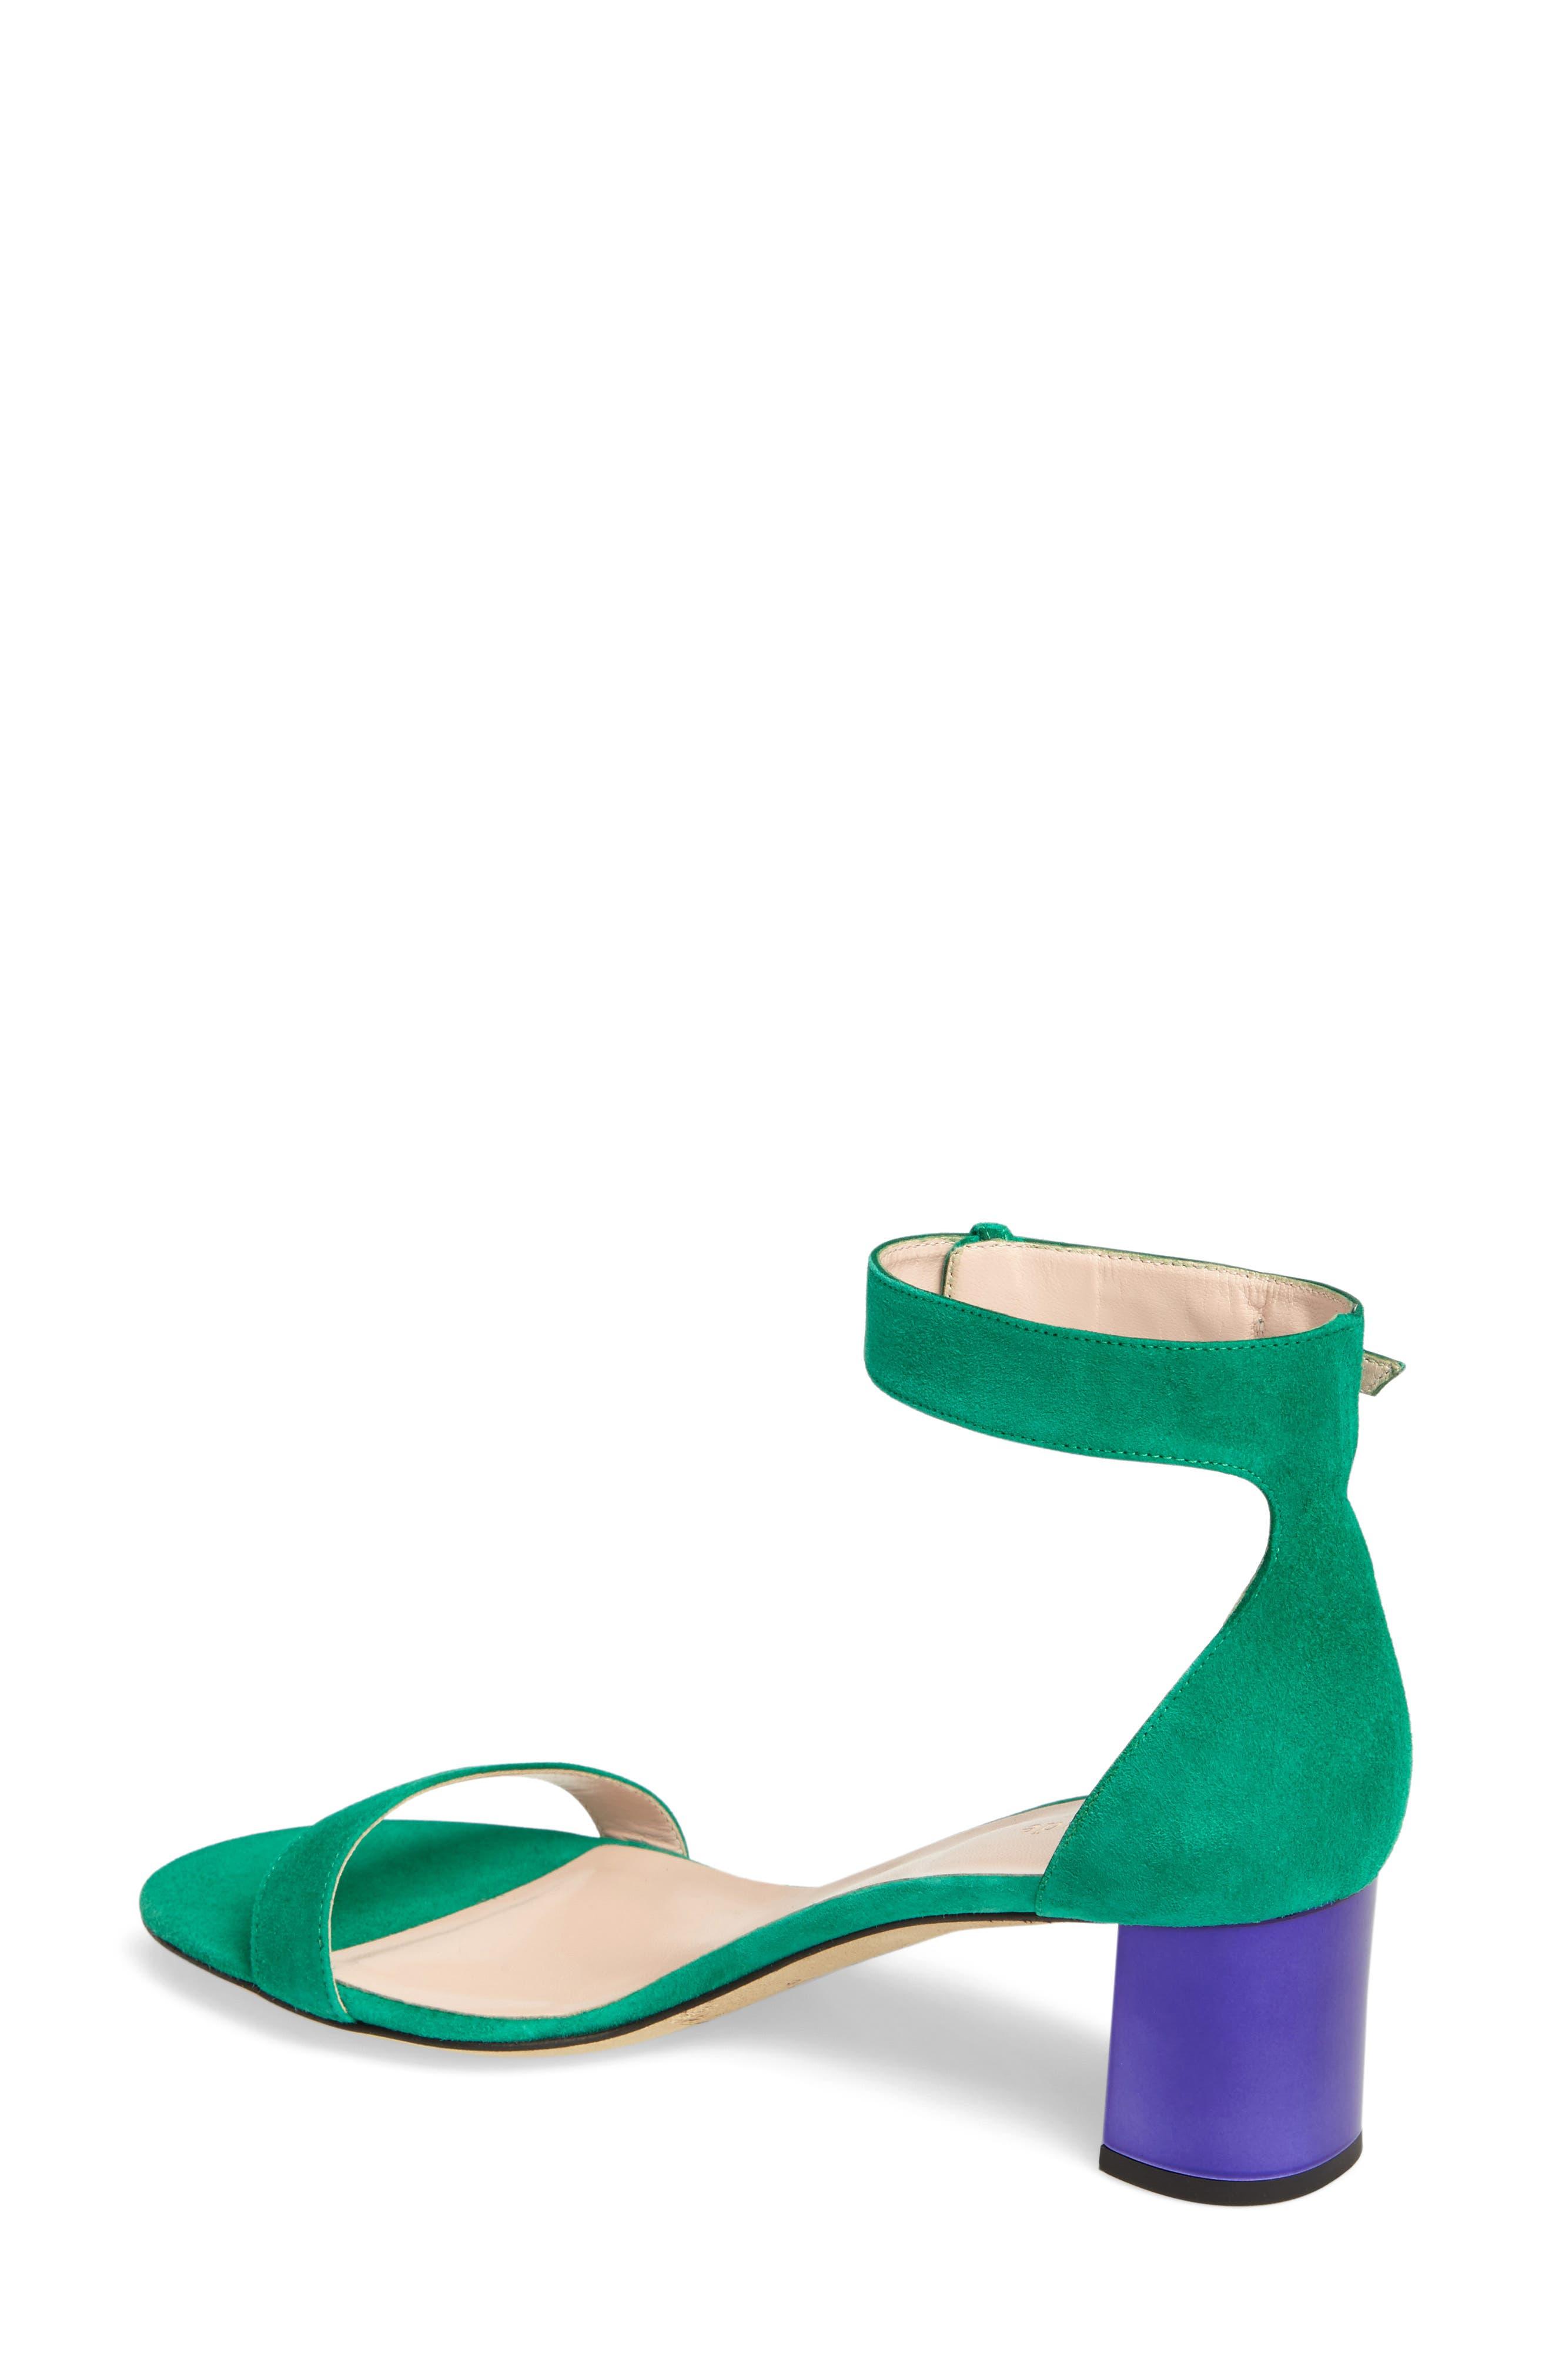 menorca ankle strap sandal,                             Alternate thumbnail 2, color,                             368